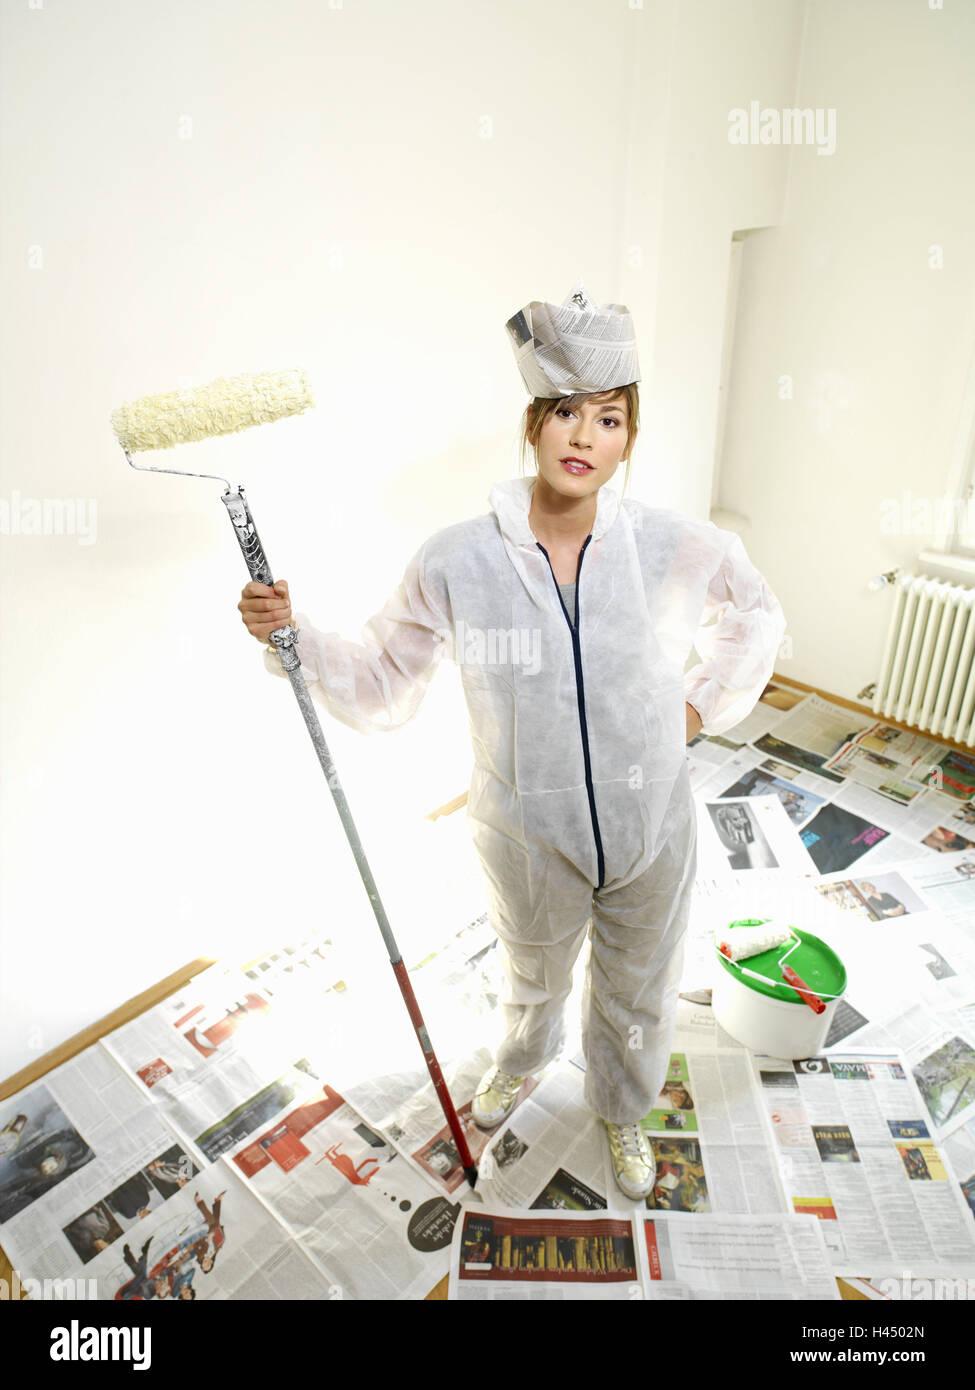 Blank, Frau, jung, des Malers insgesamt, Papierhut, Farbe Rolle ...